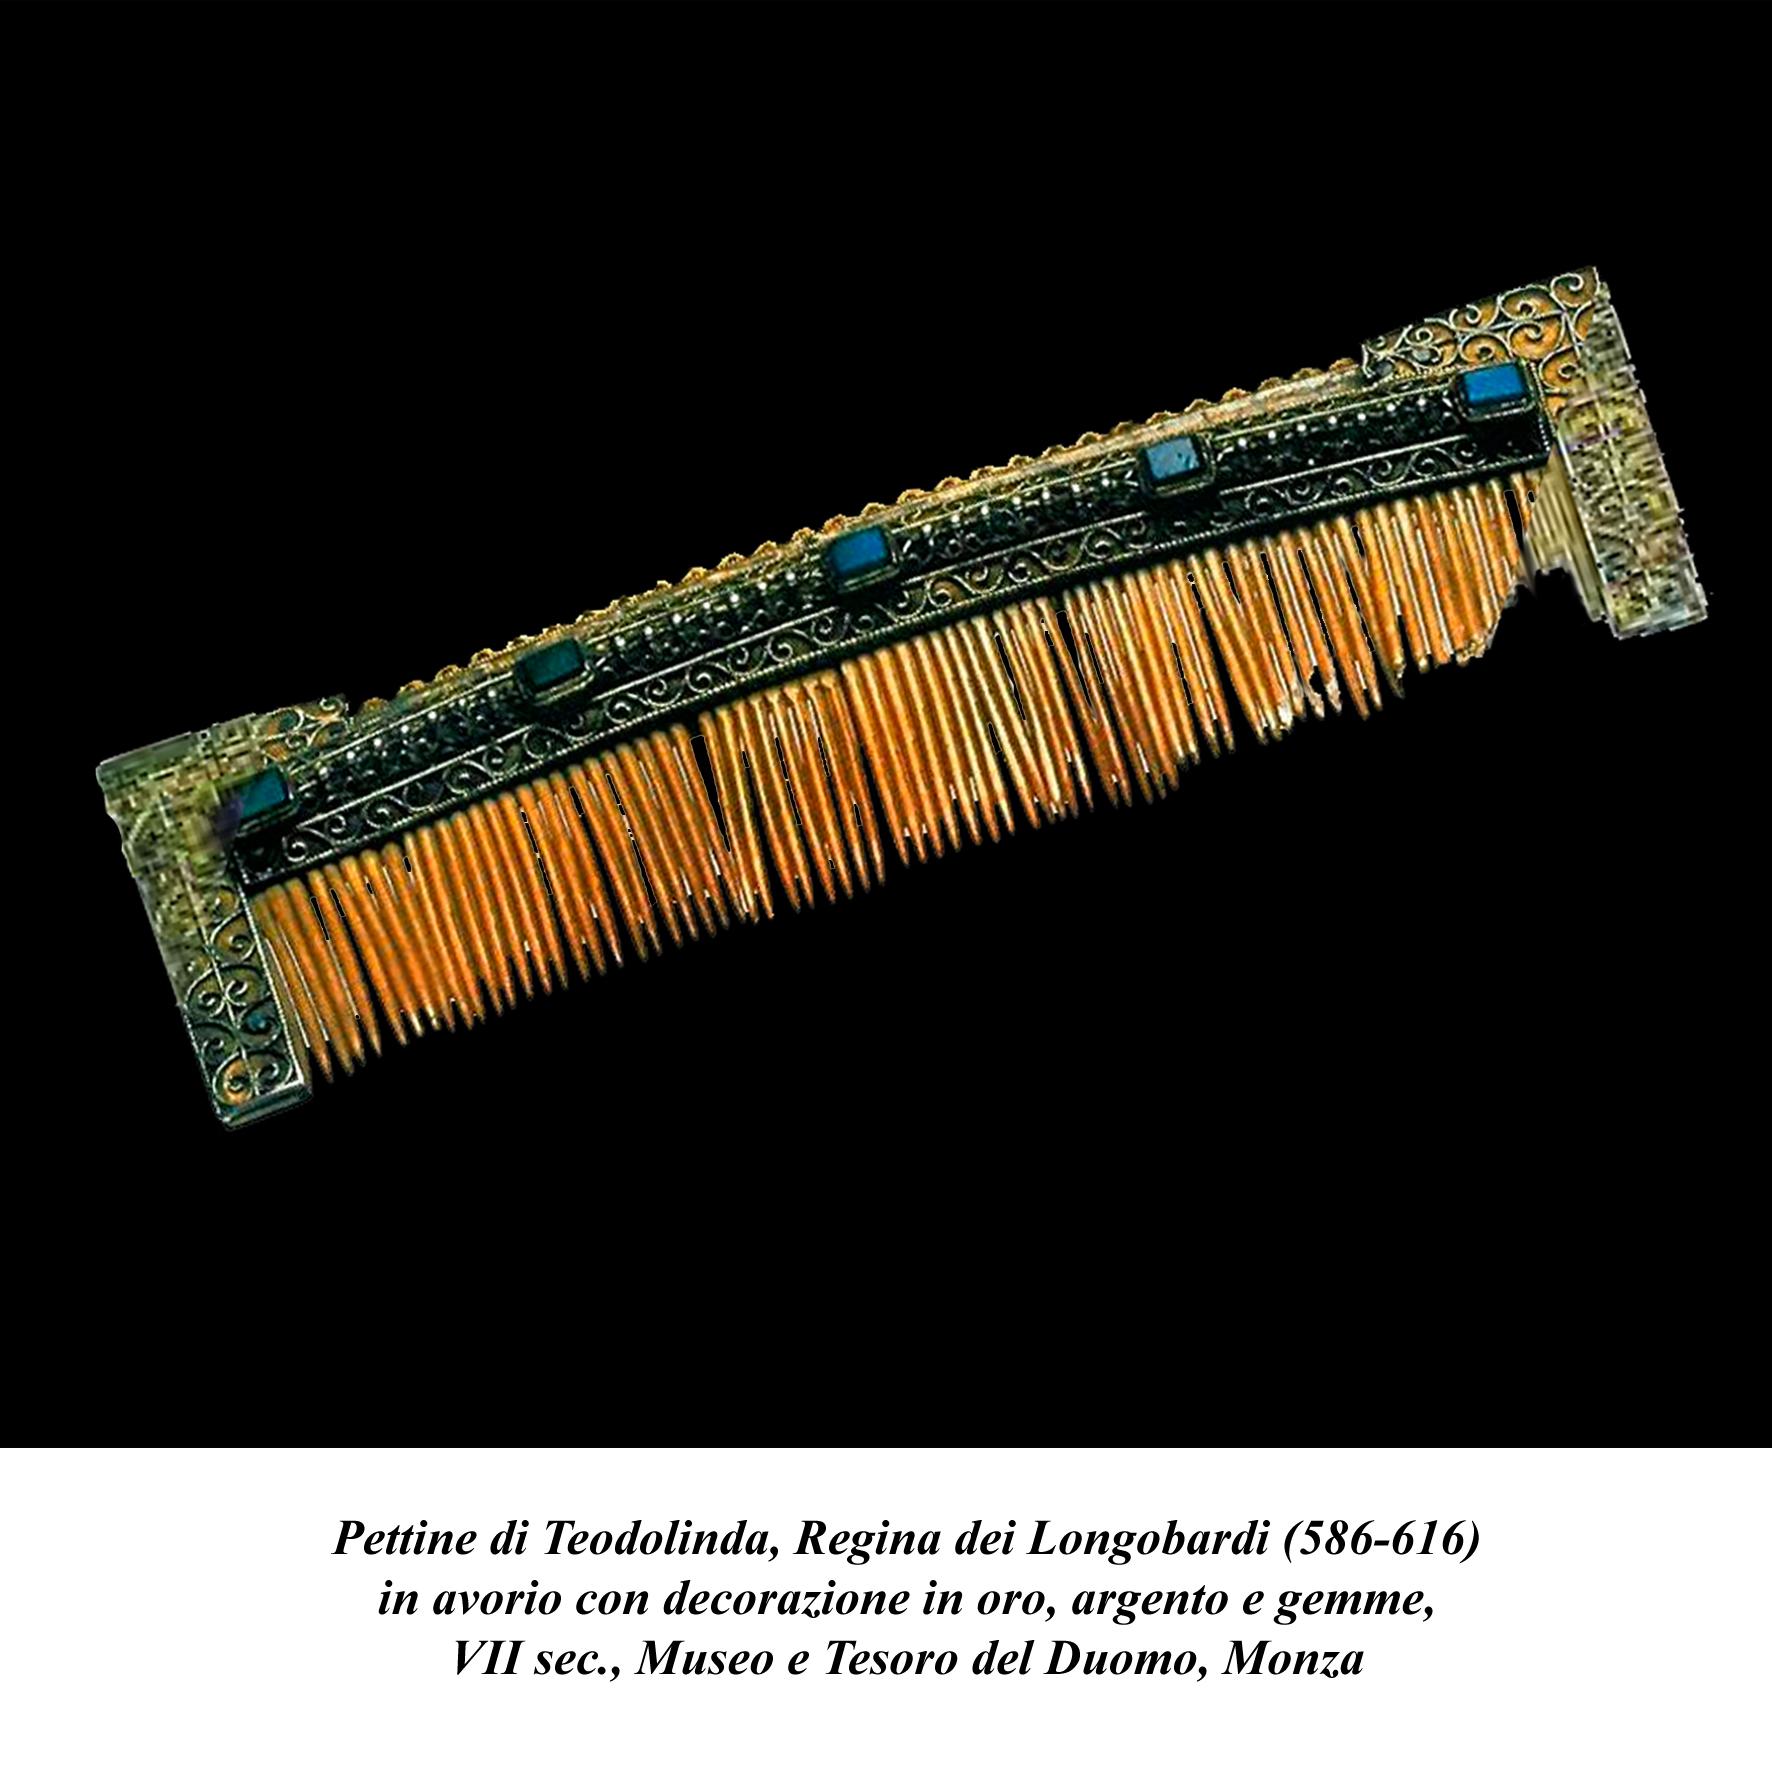 Pettine di Teodolinda, Regina dei Longobardi (586-616)